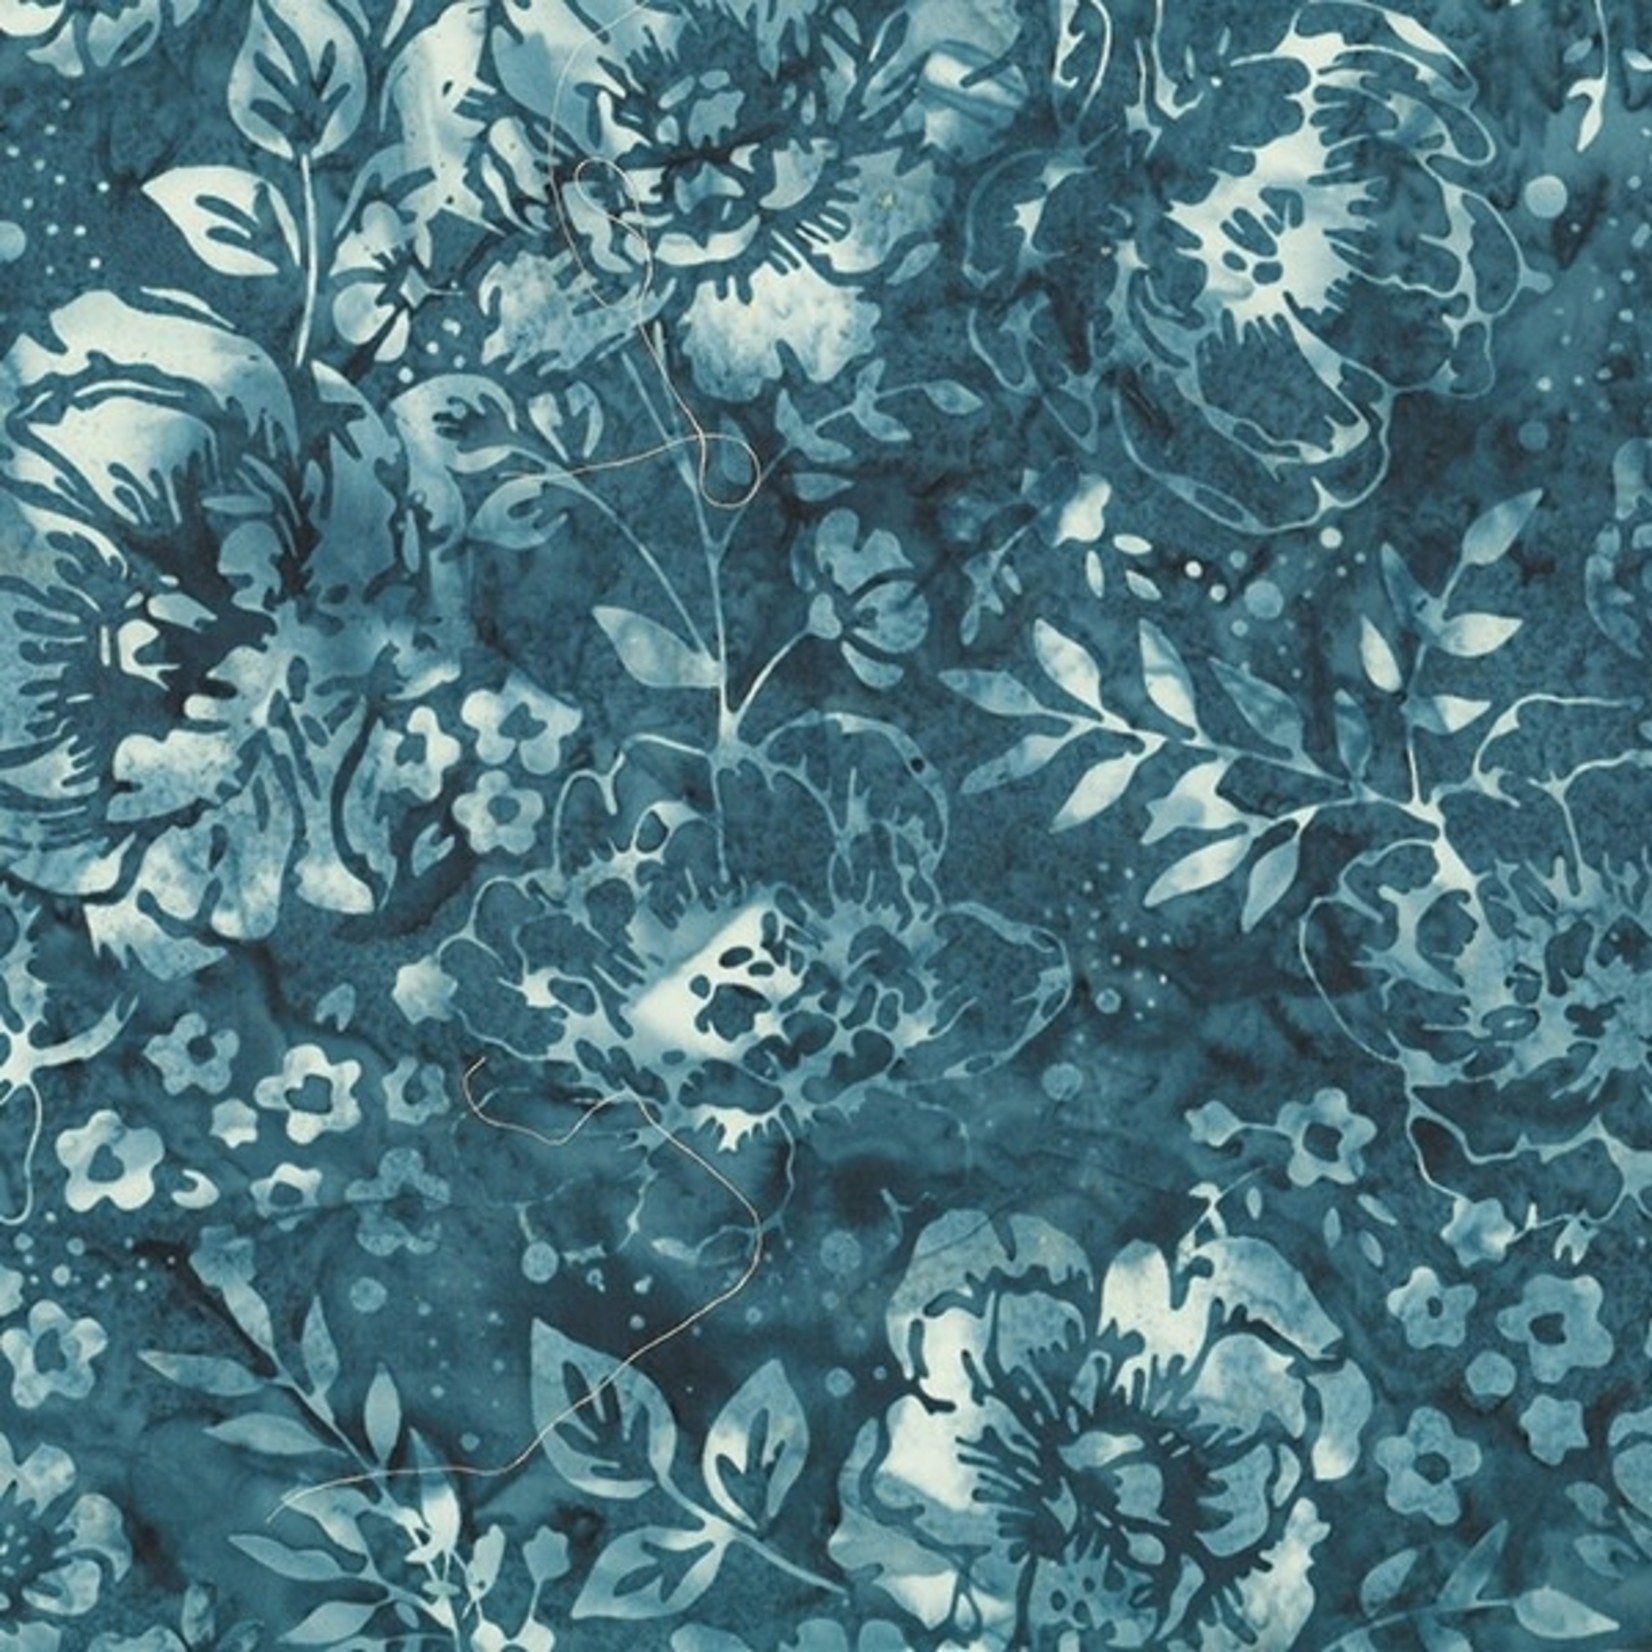 Hoffman Bali Batiks, London Floral 2363-242 $0.20 per cm or $20/m